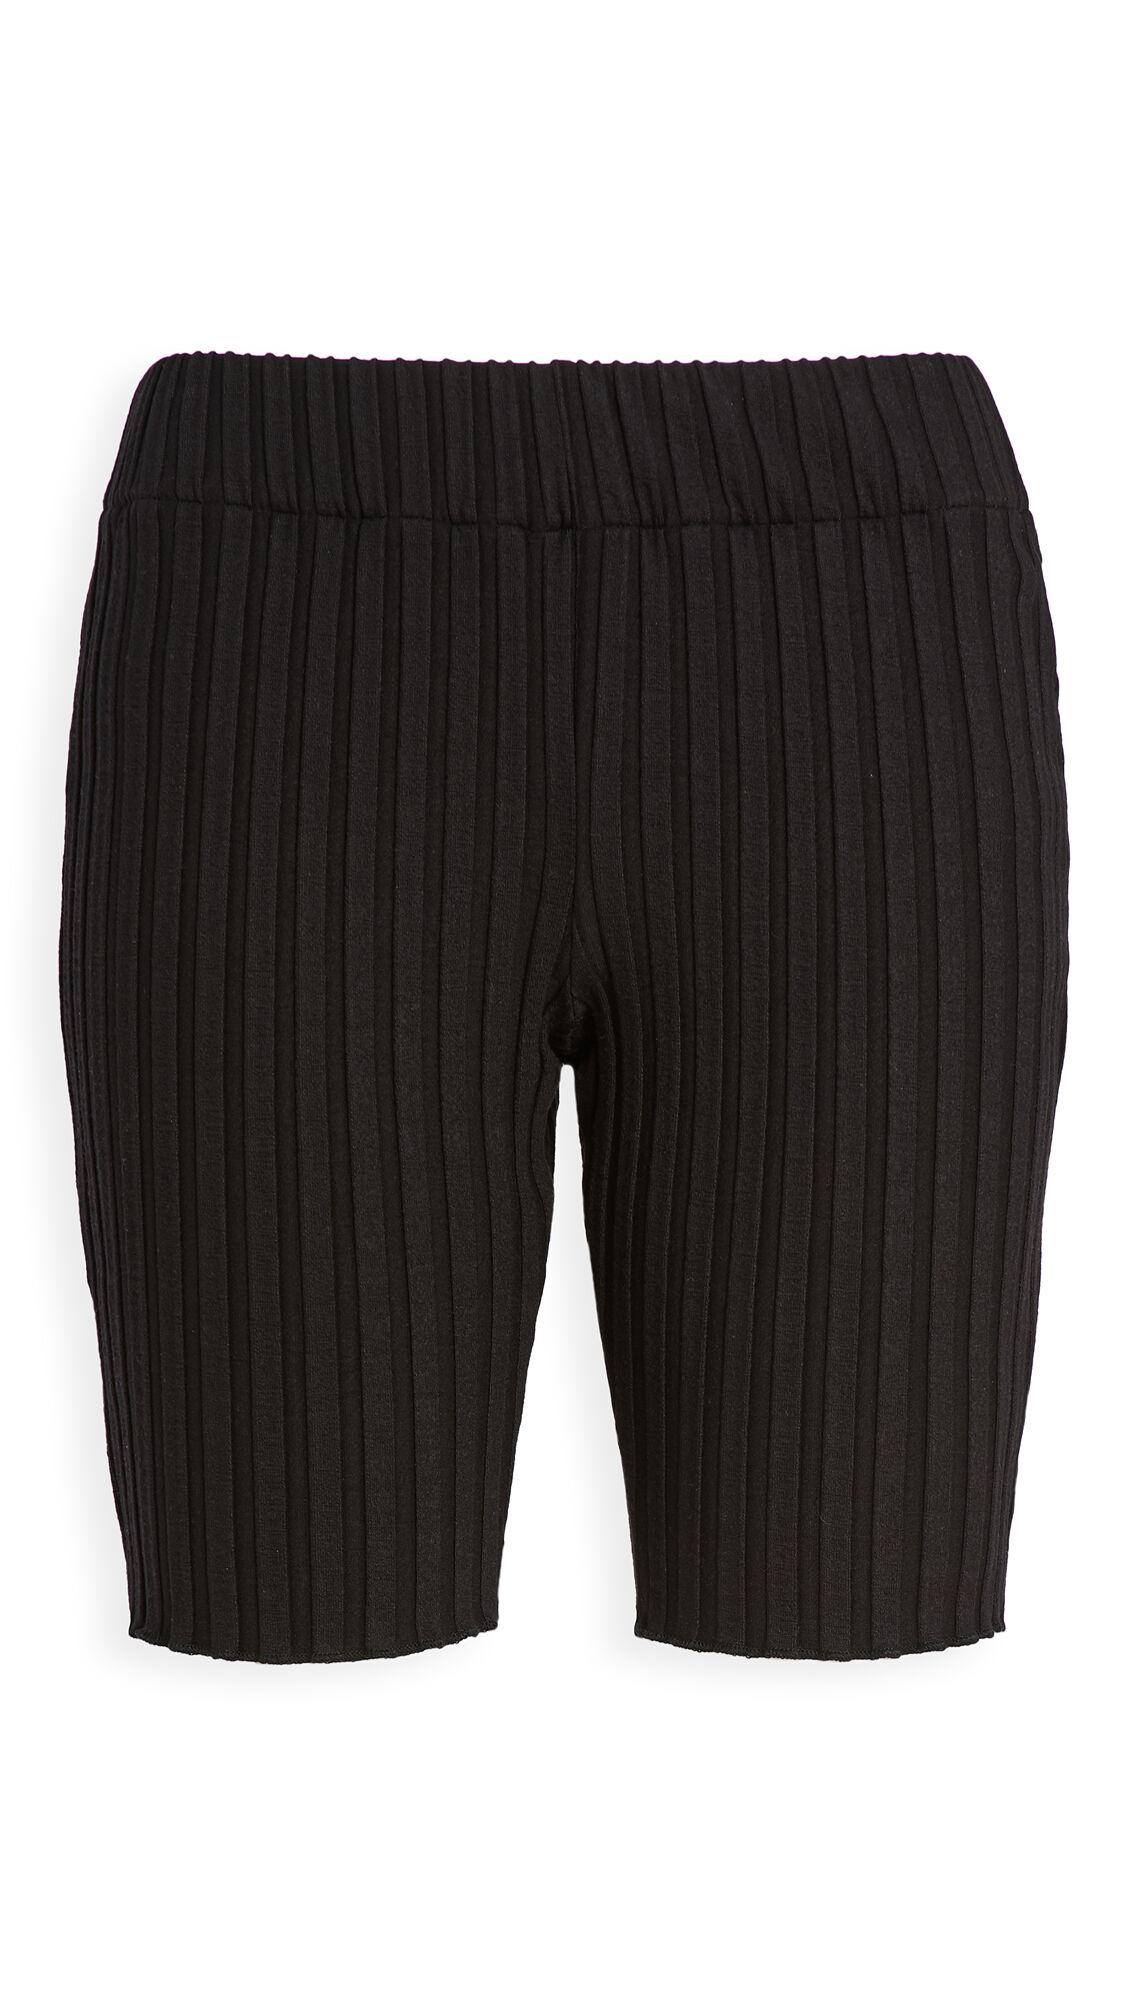 Simon Miller Burr Bike Shorts  - Black - Size: Extra Small